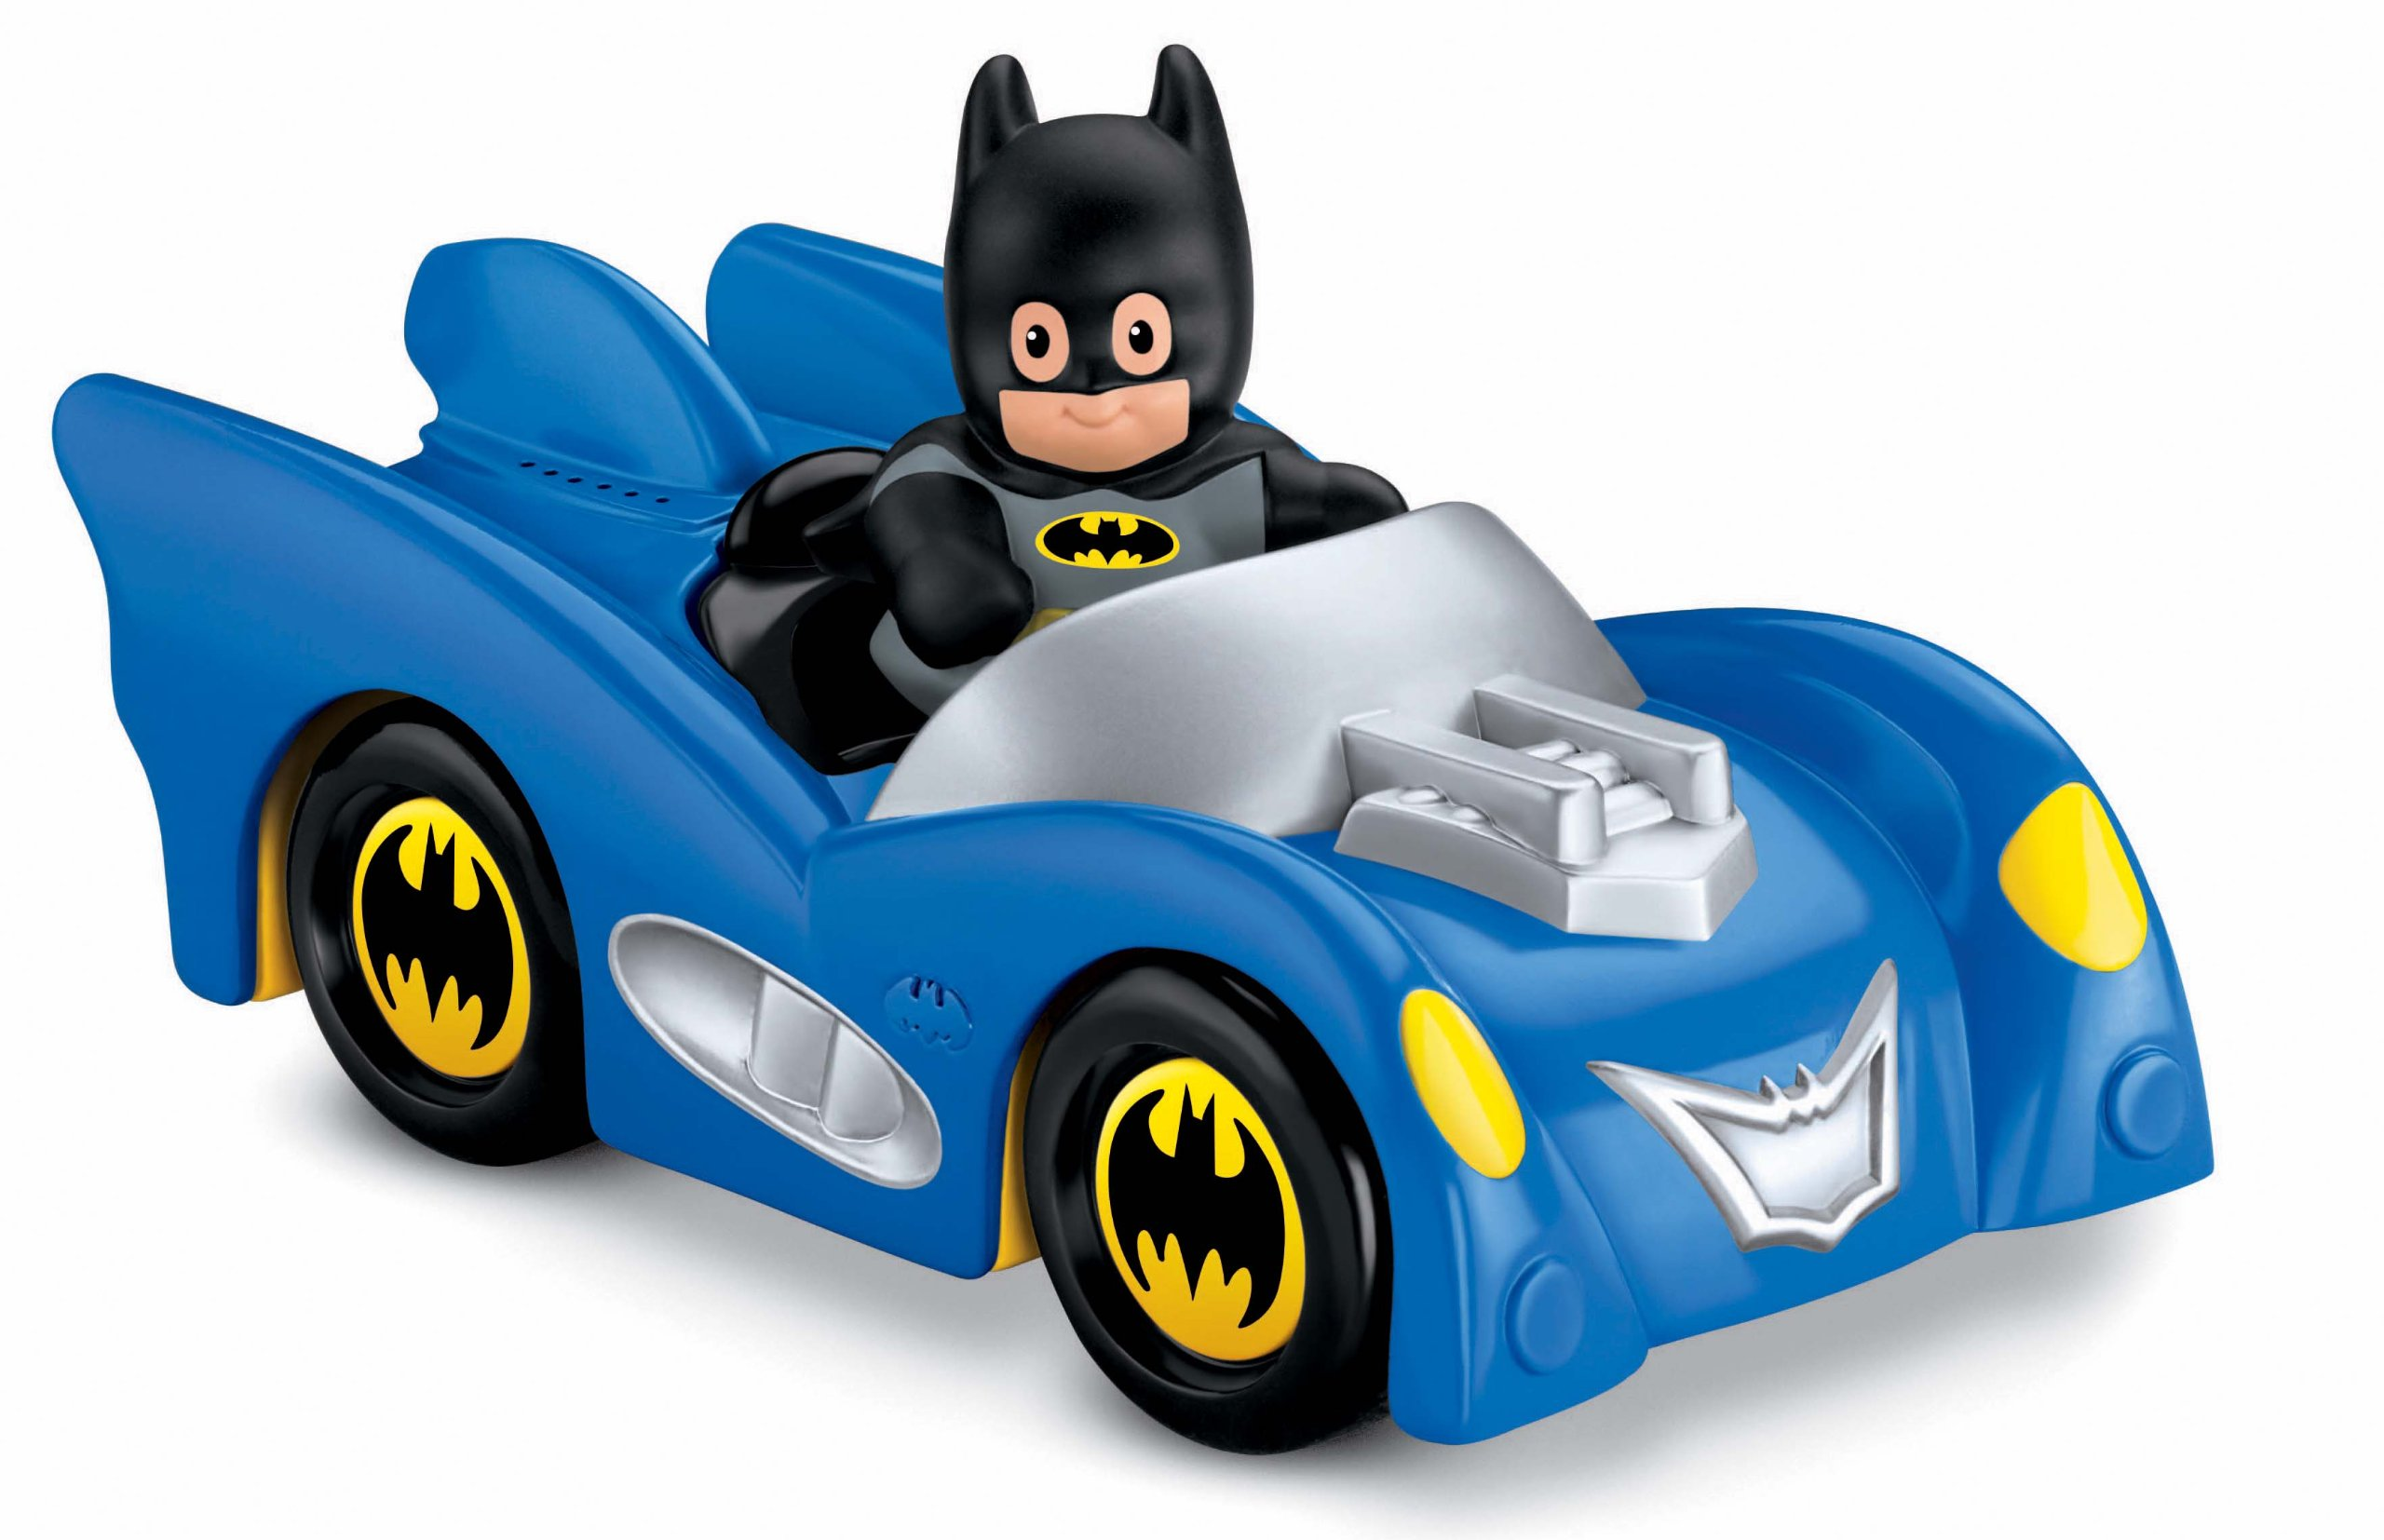 Fisher-Price Little People DC Super Friends Batmobile